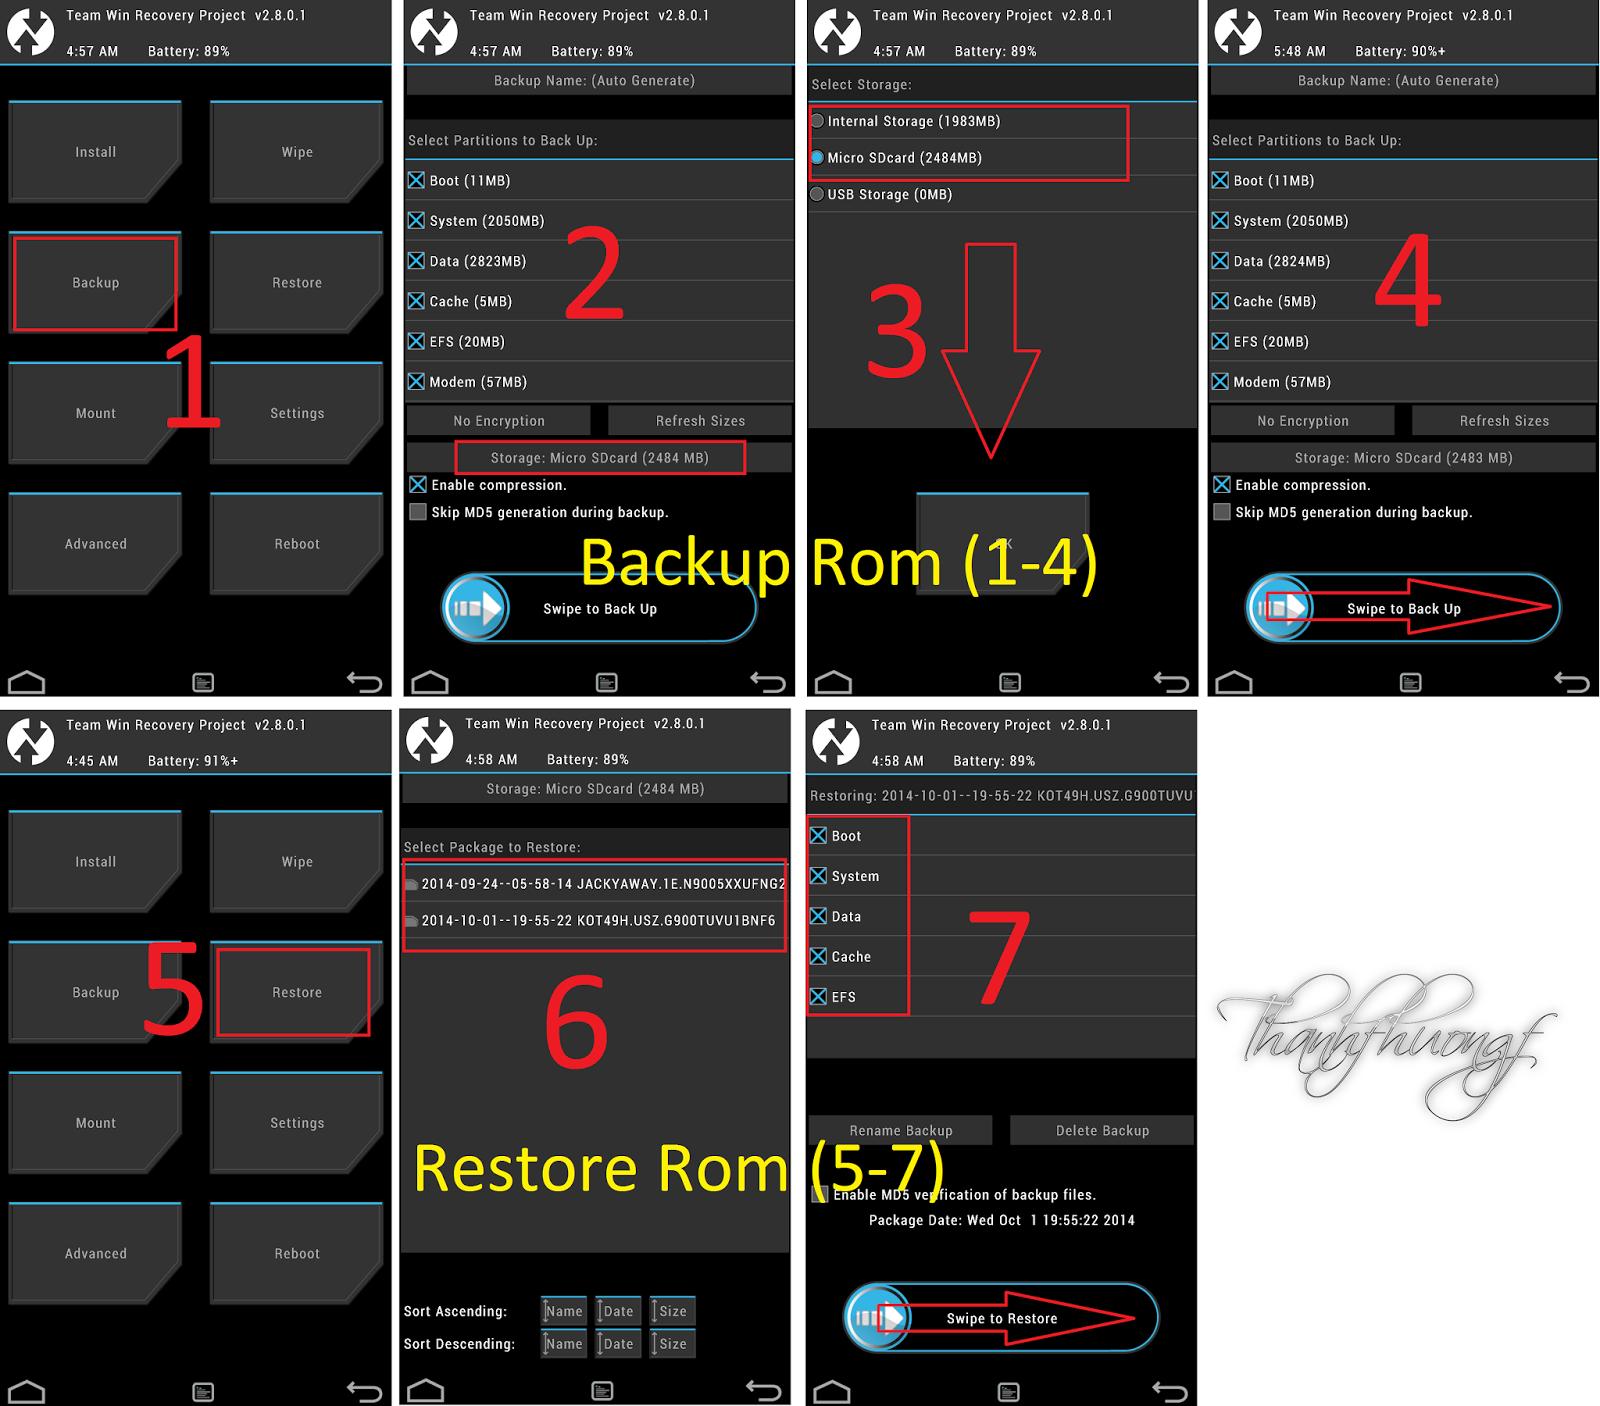 Team win recovery project как сделать хард ресет